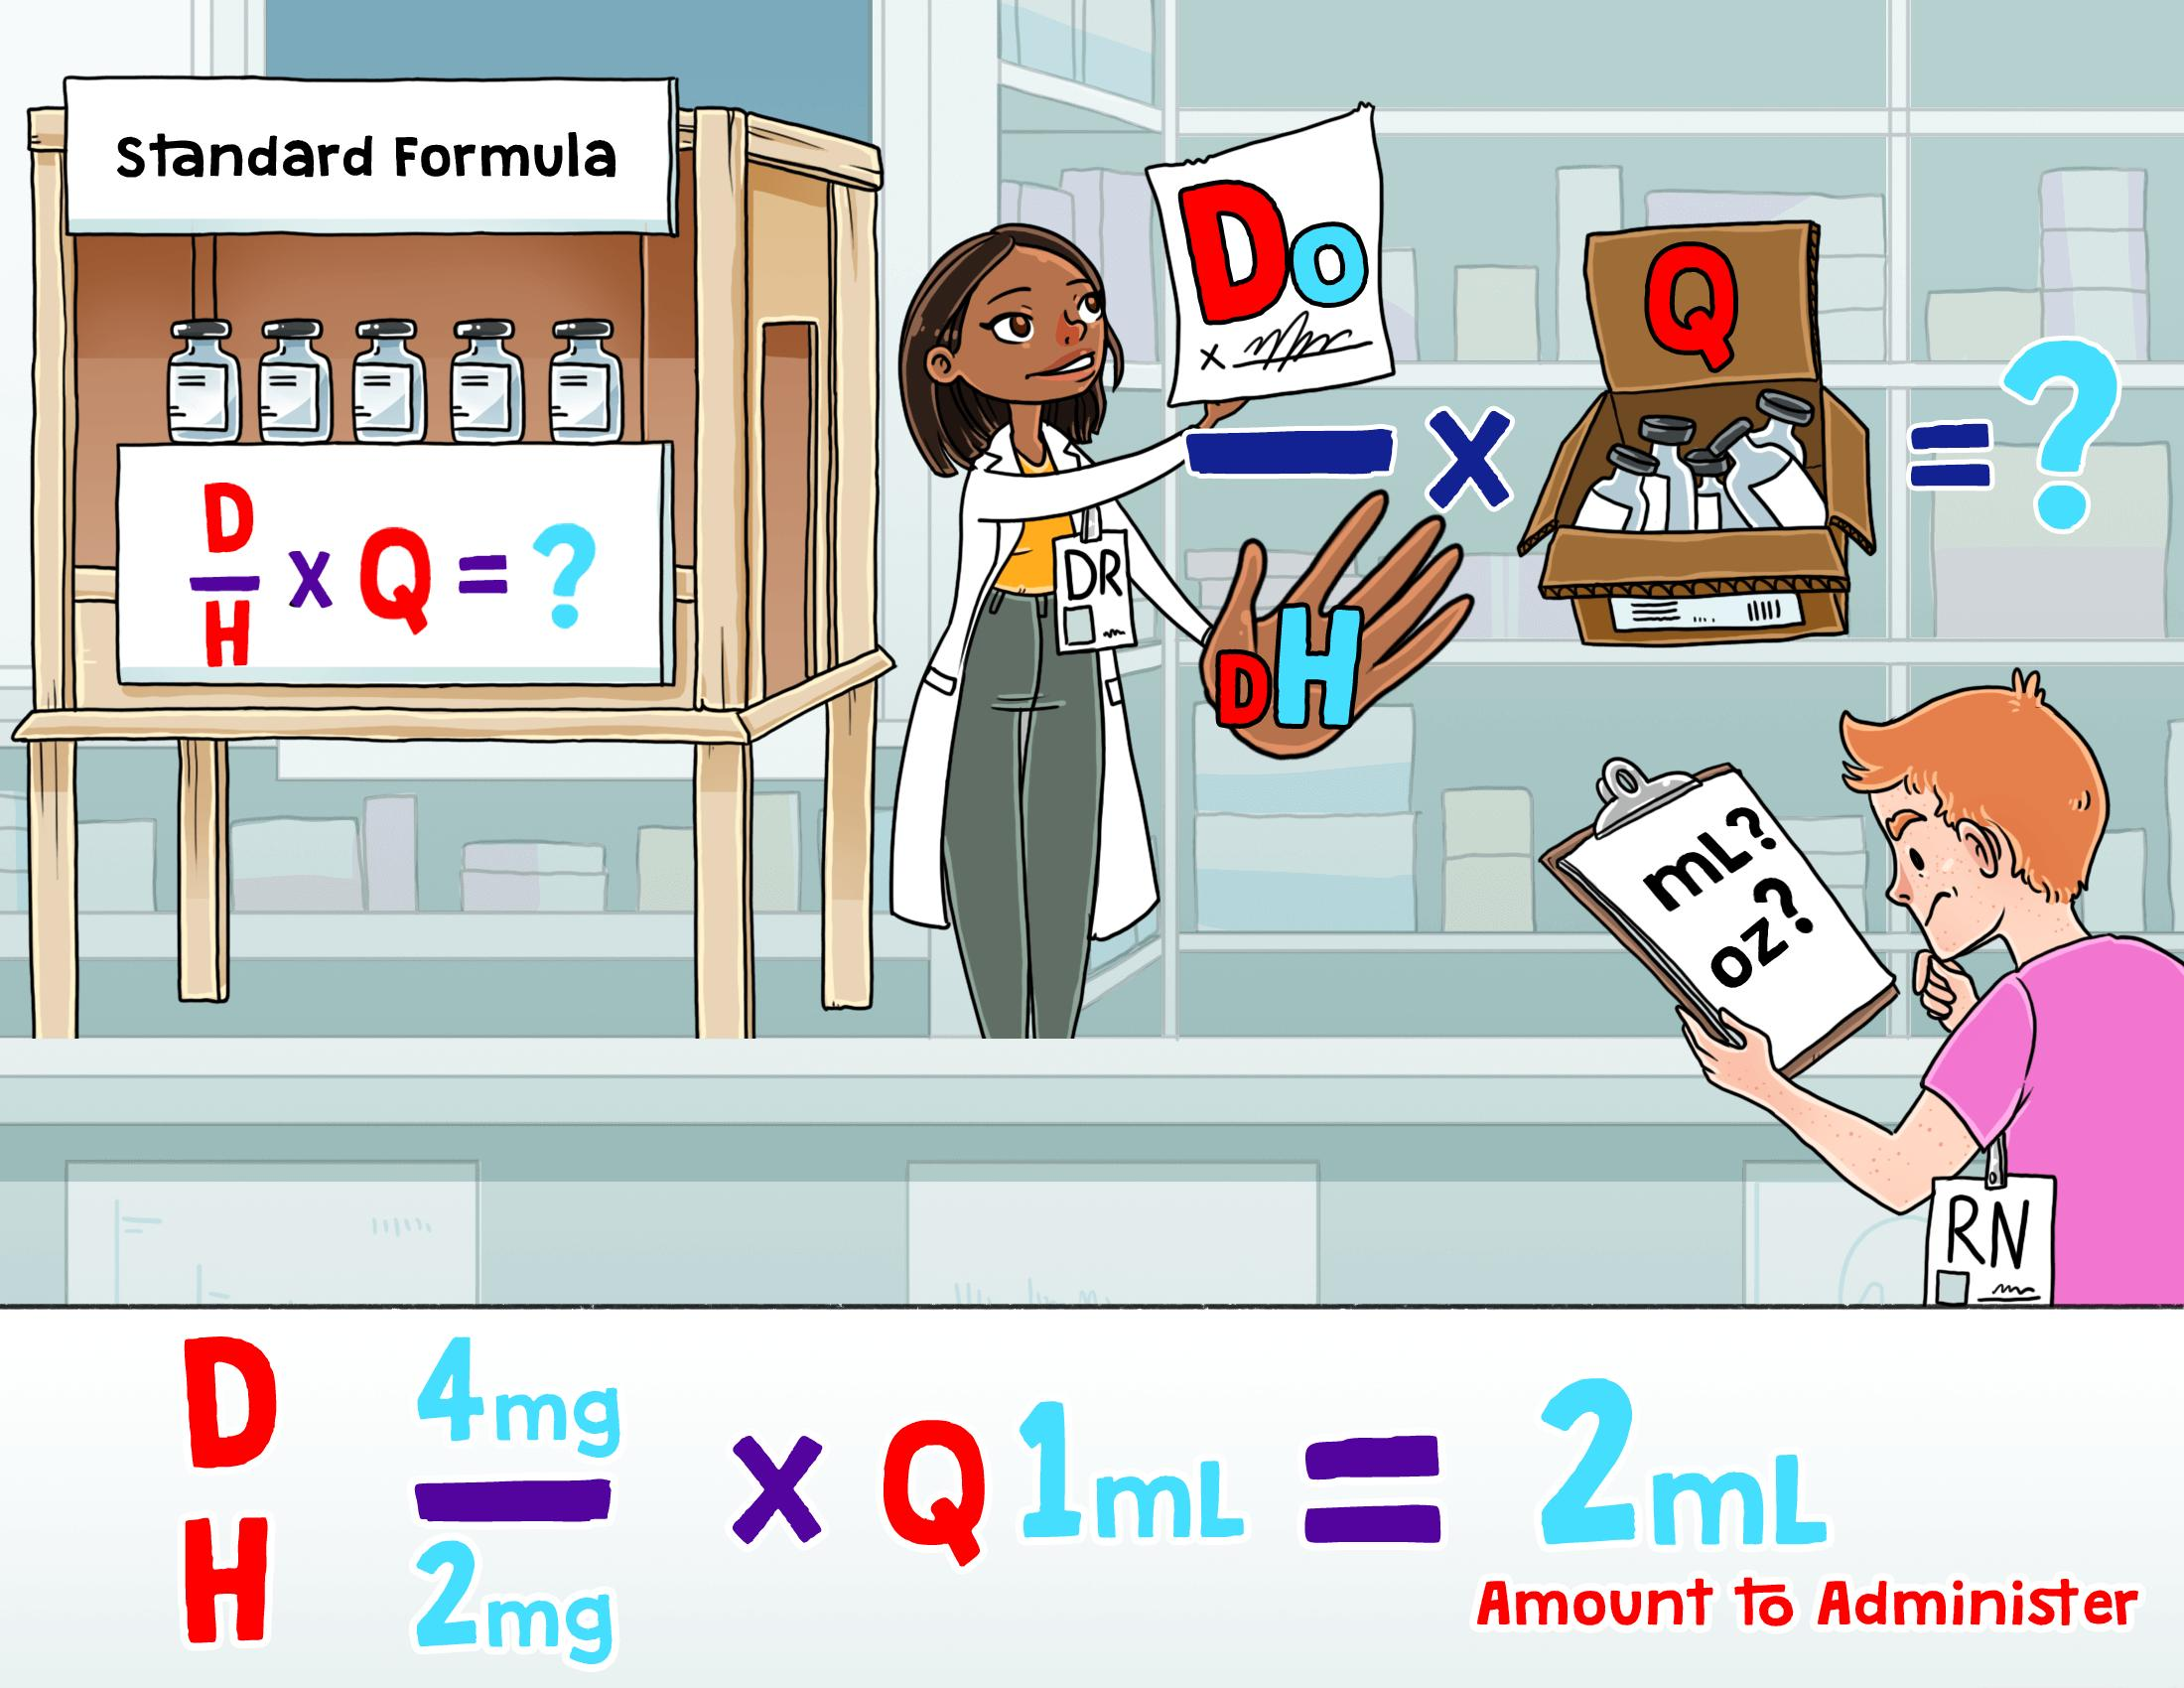 Standard Formula